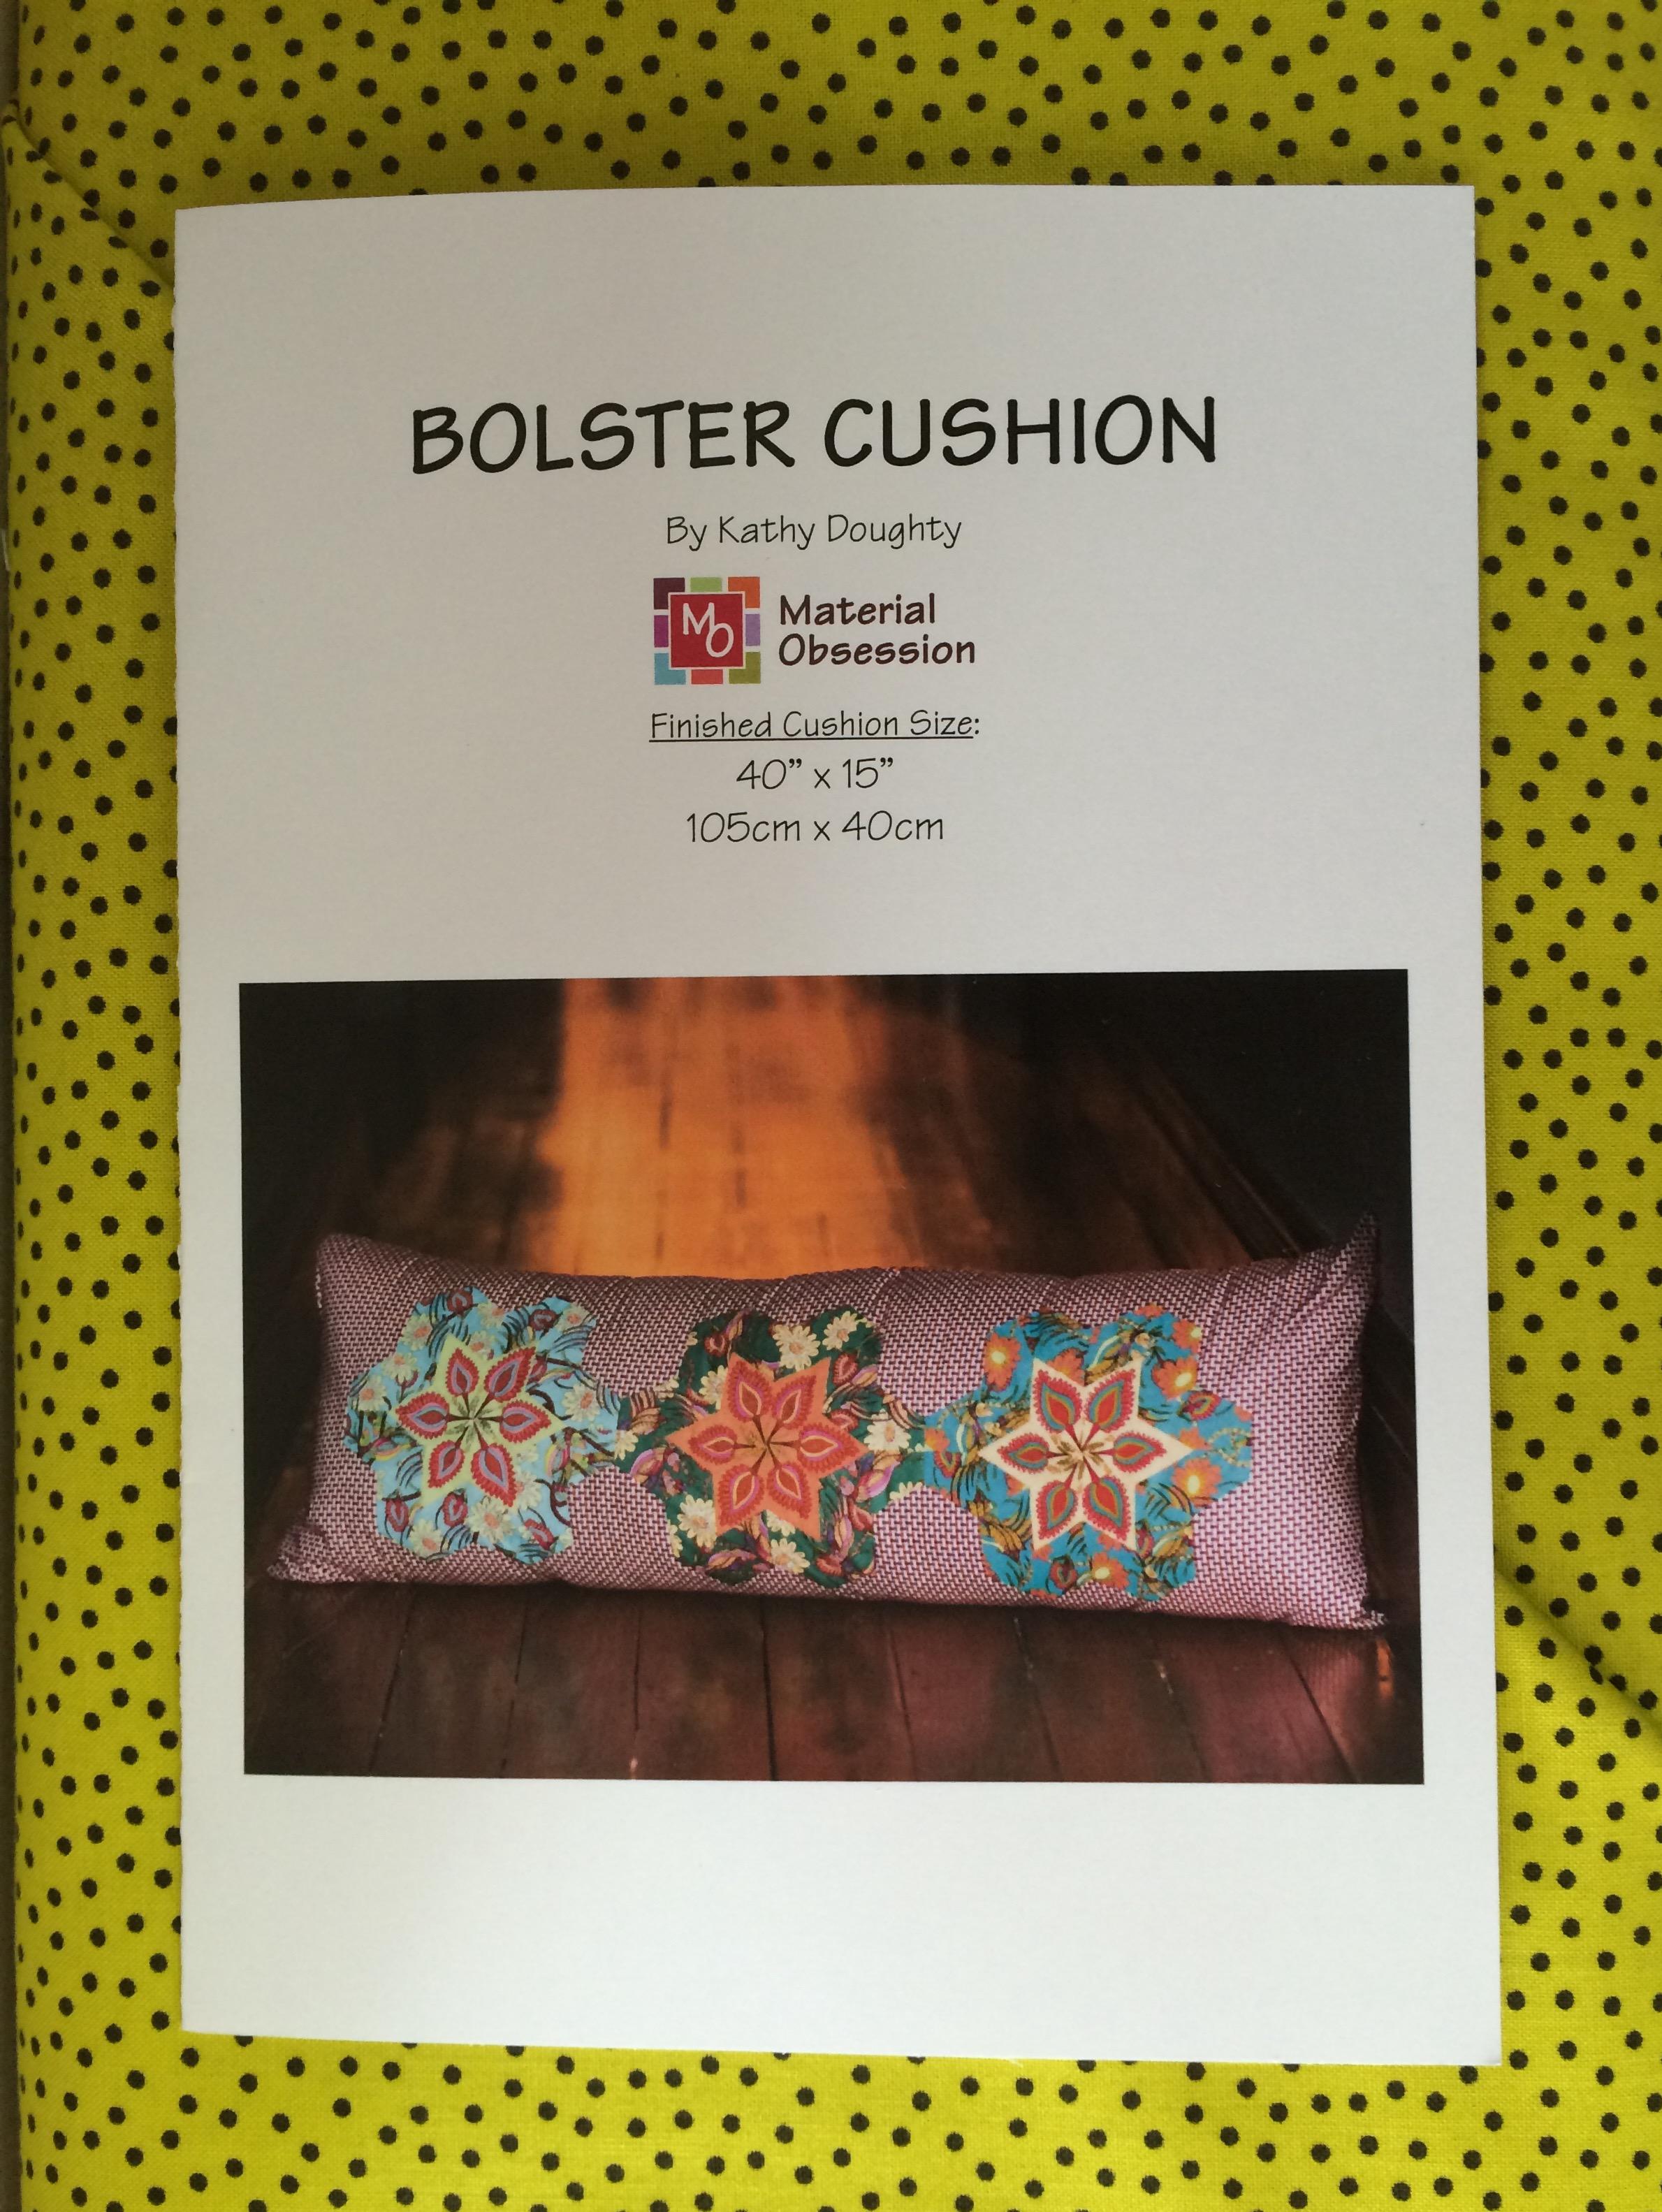 The Bolster Cushion pattern